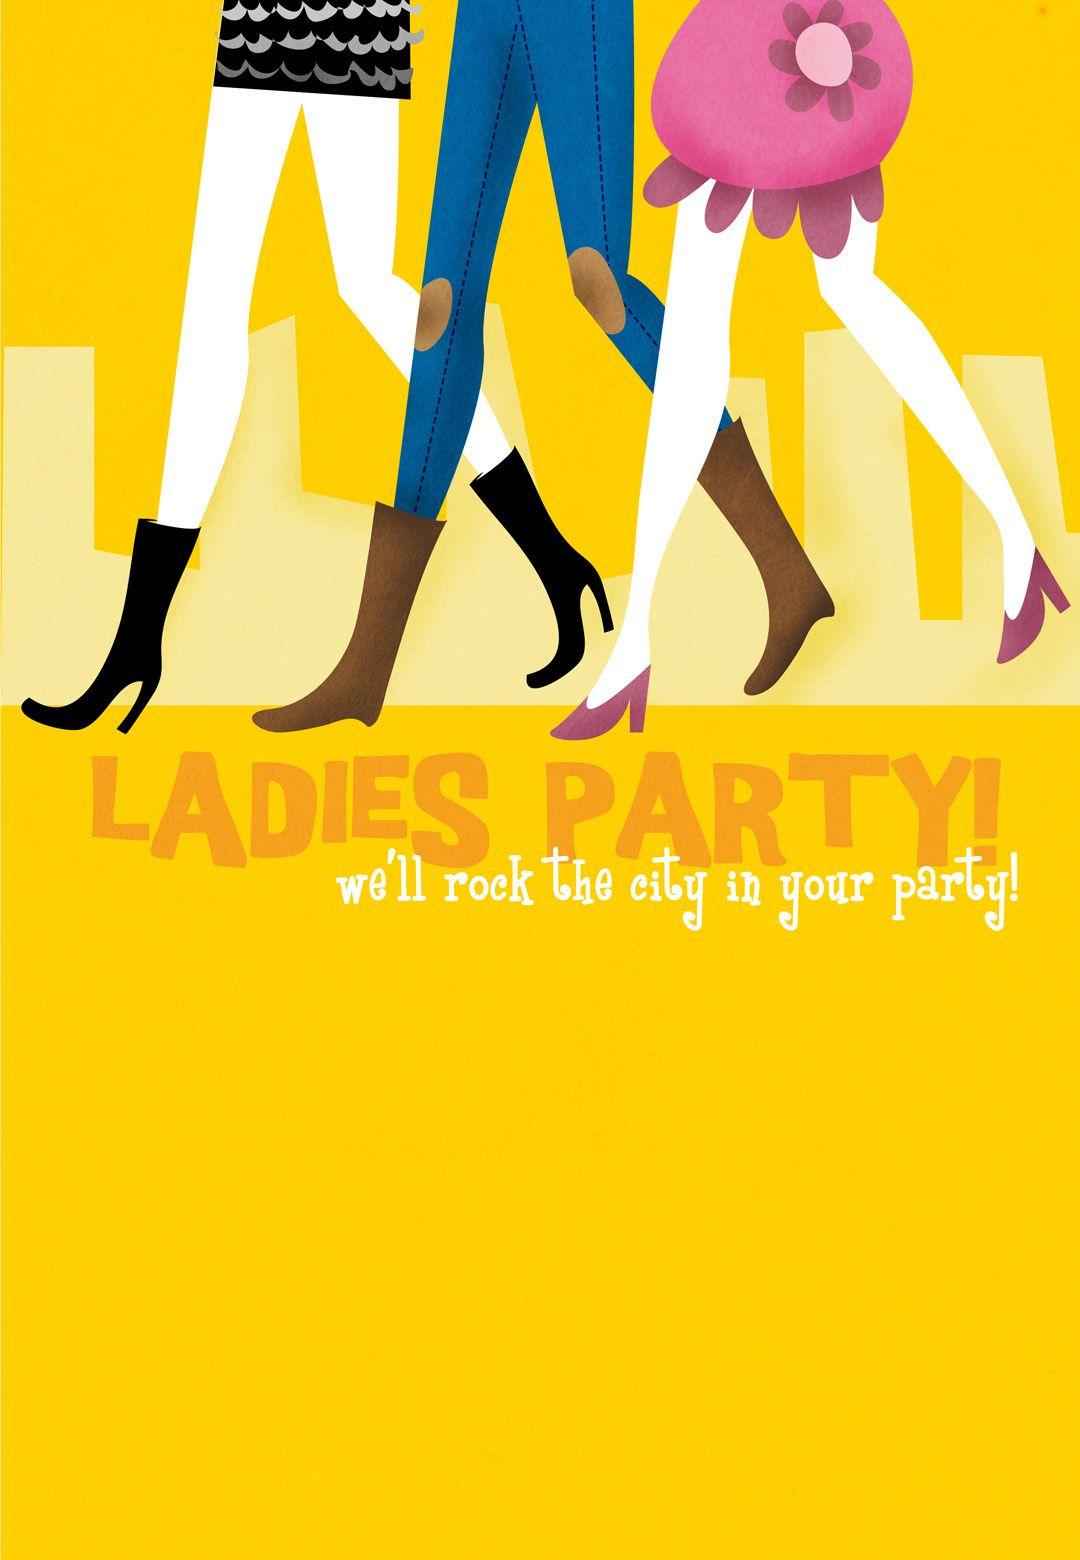 Bachelorette Party Invitation Free Printable – Free Online Bachelorette Party Invitations